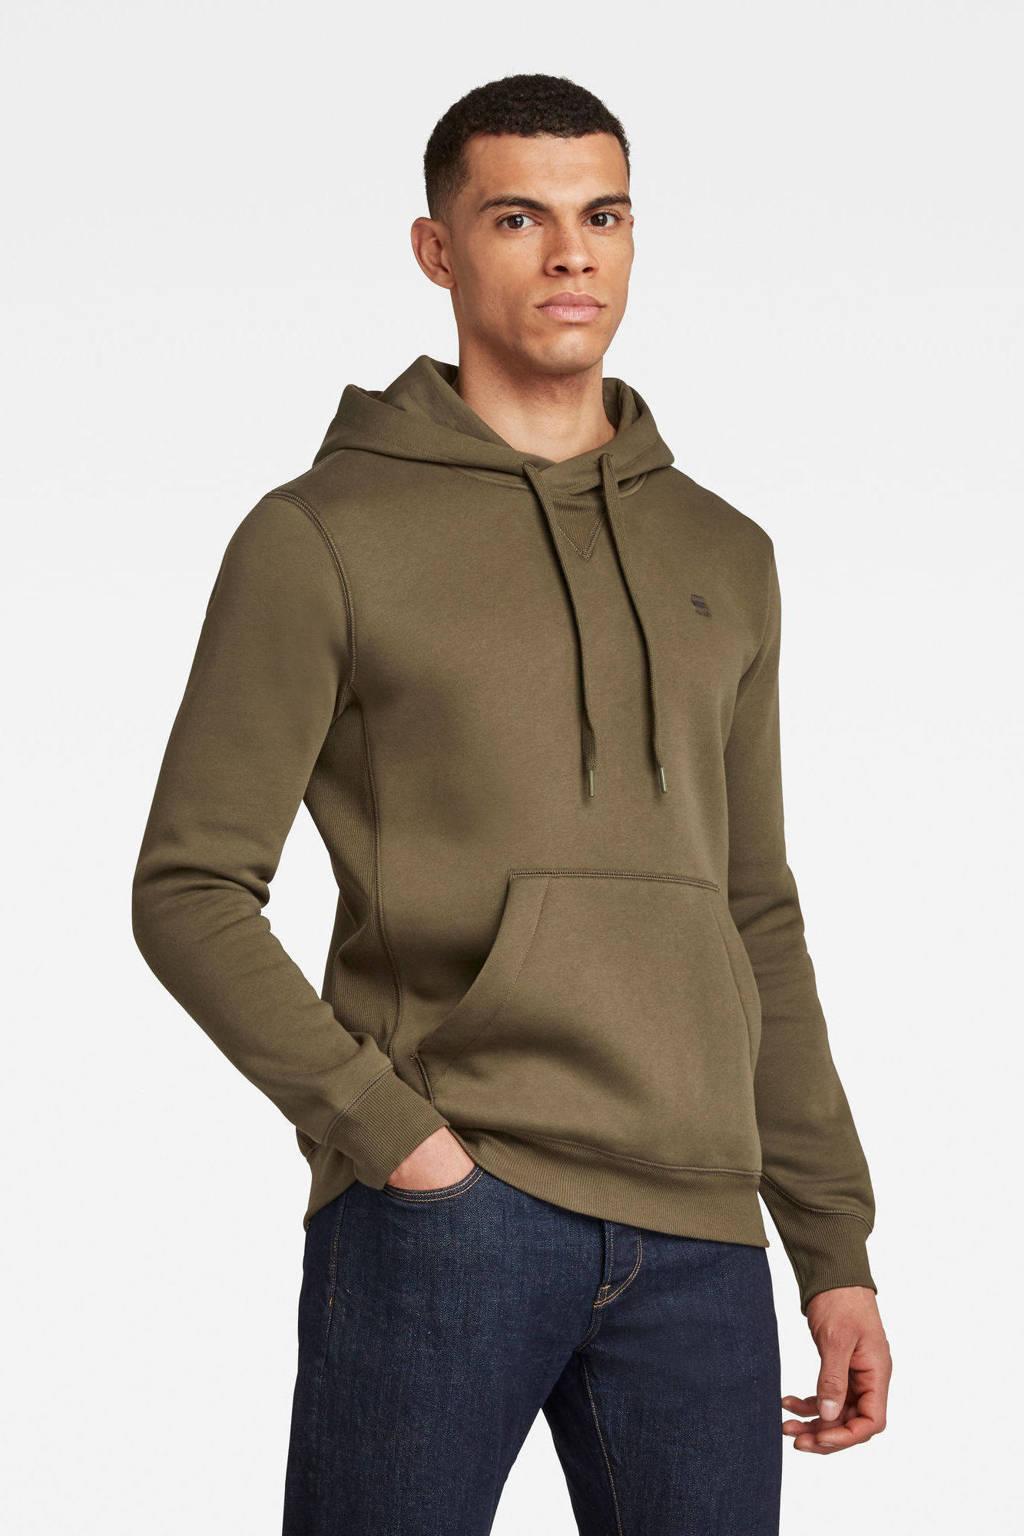 G-Star RAW hoodie met biologisch katoen kaki, Kaki